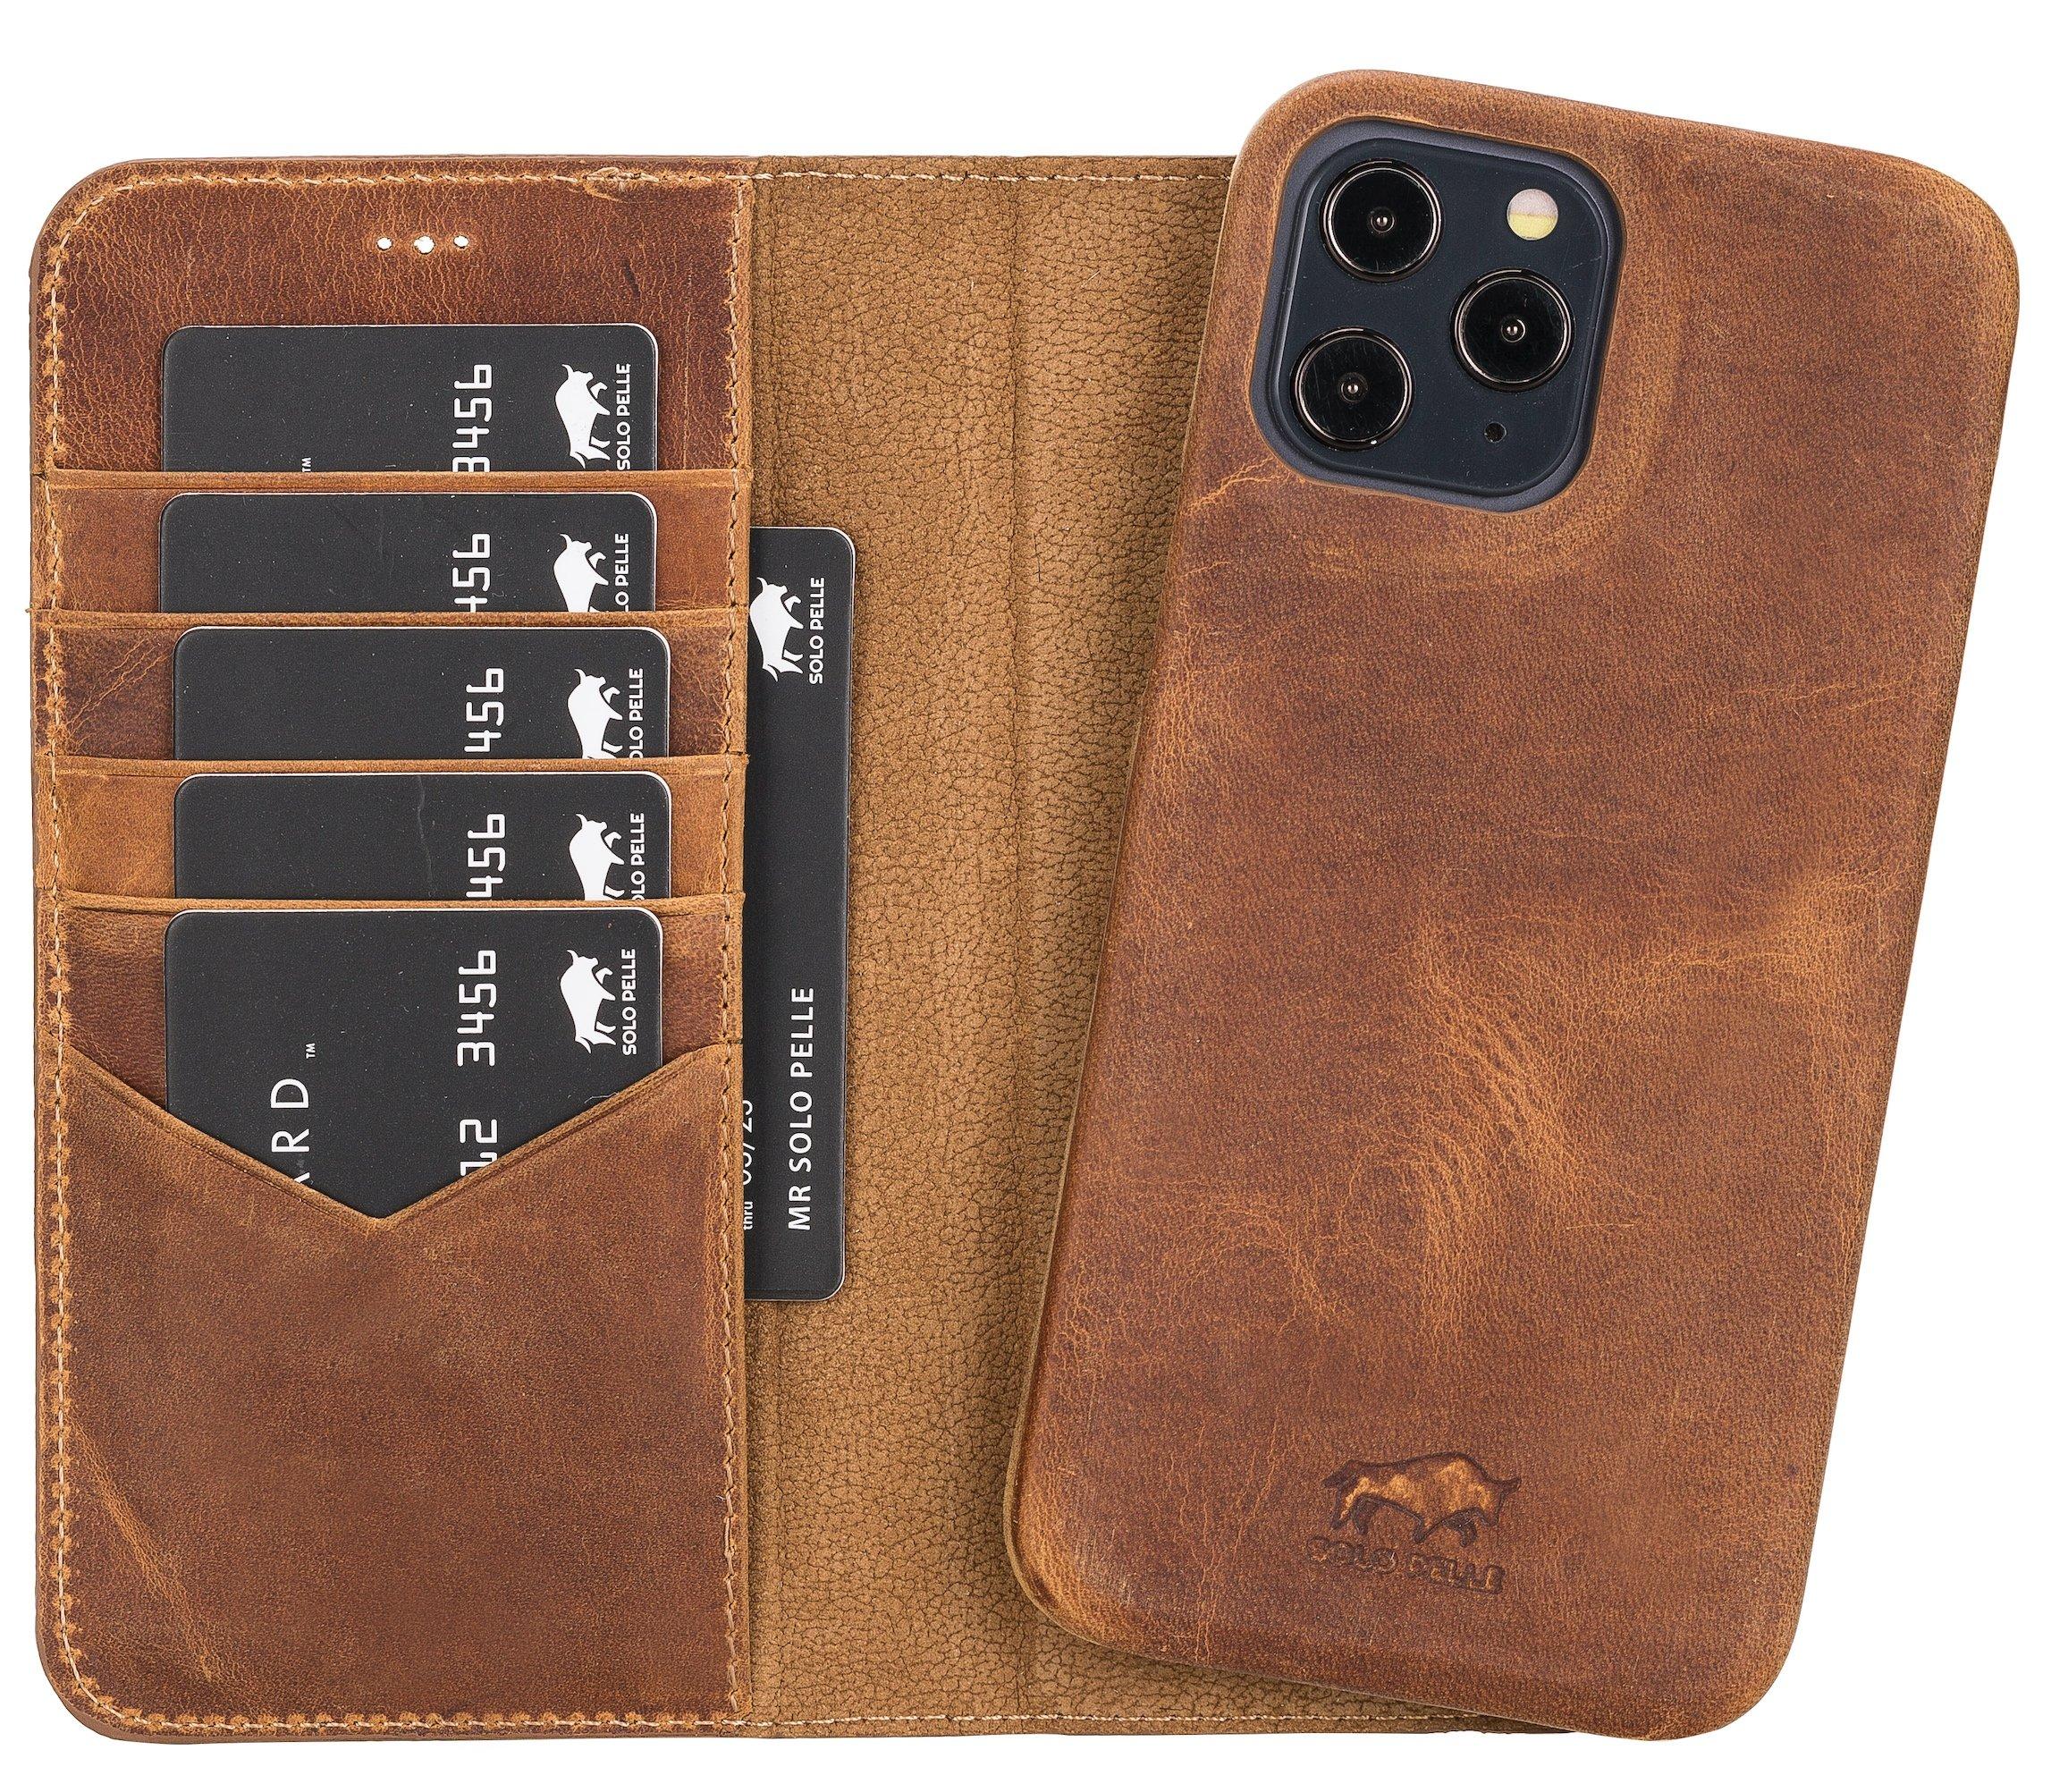 "iPhone 12 Pro Max abnehmbare Lederhülle ""Clemson"" MagSafe kompatibel (Vollleder Camel Braun)"